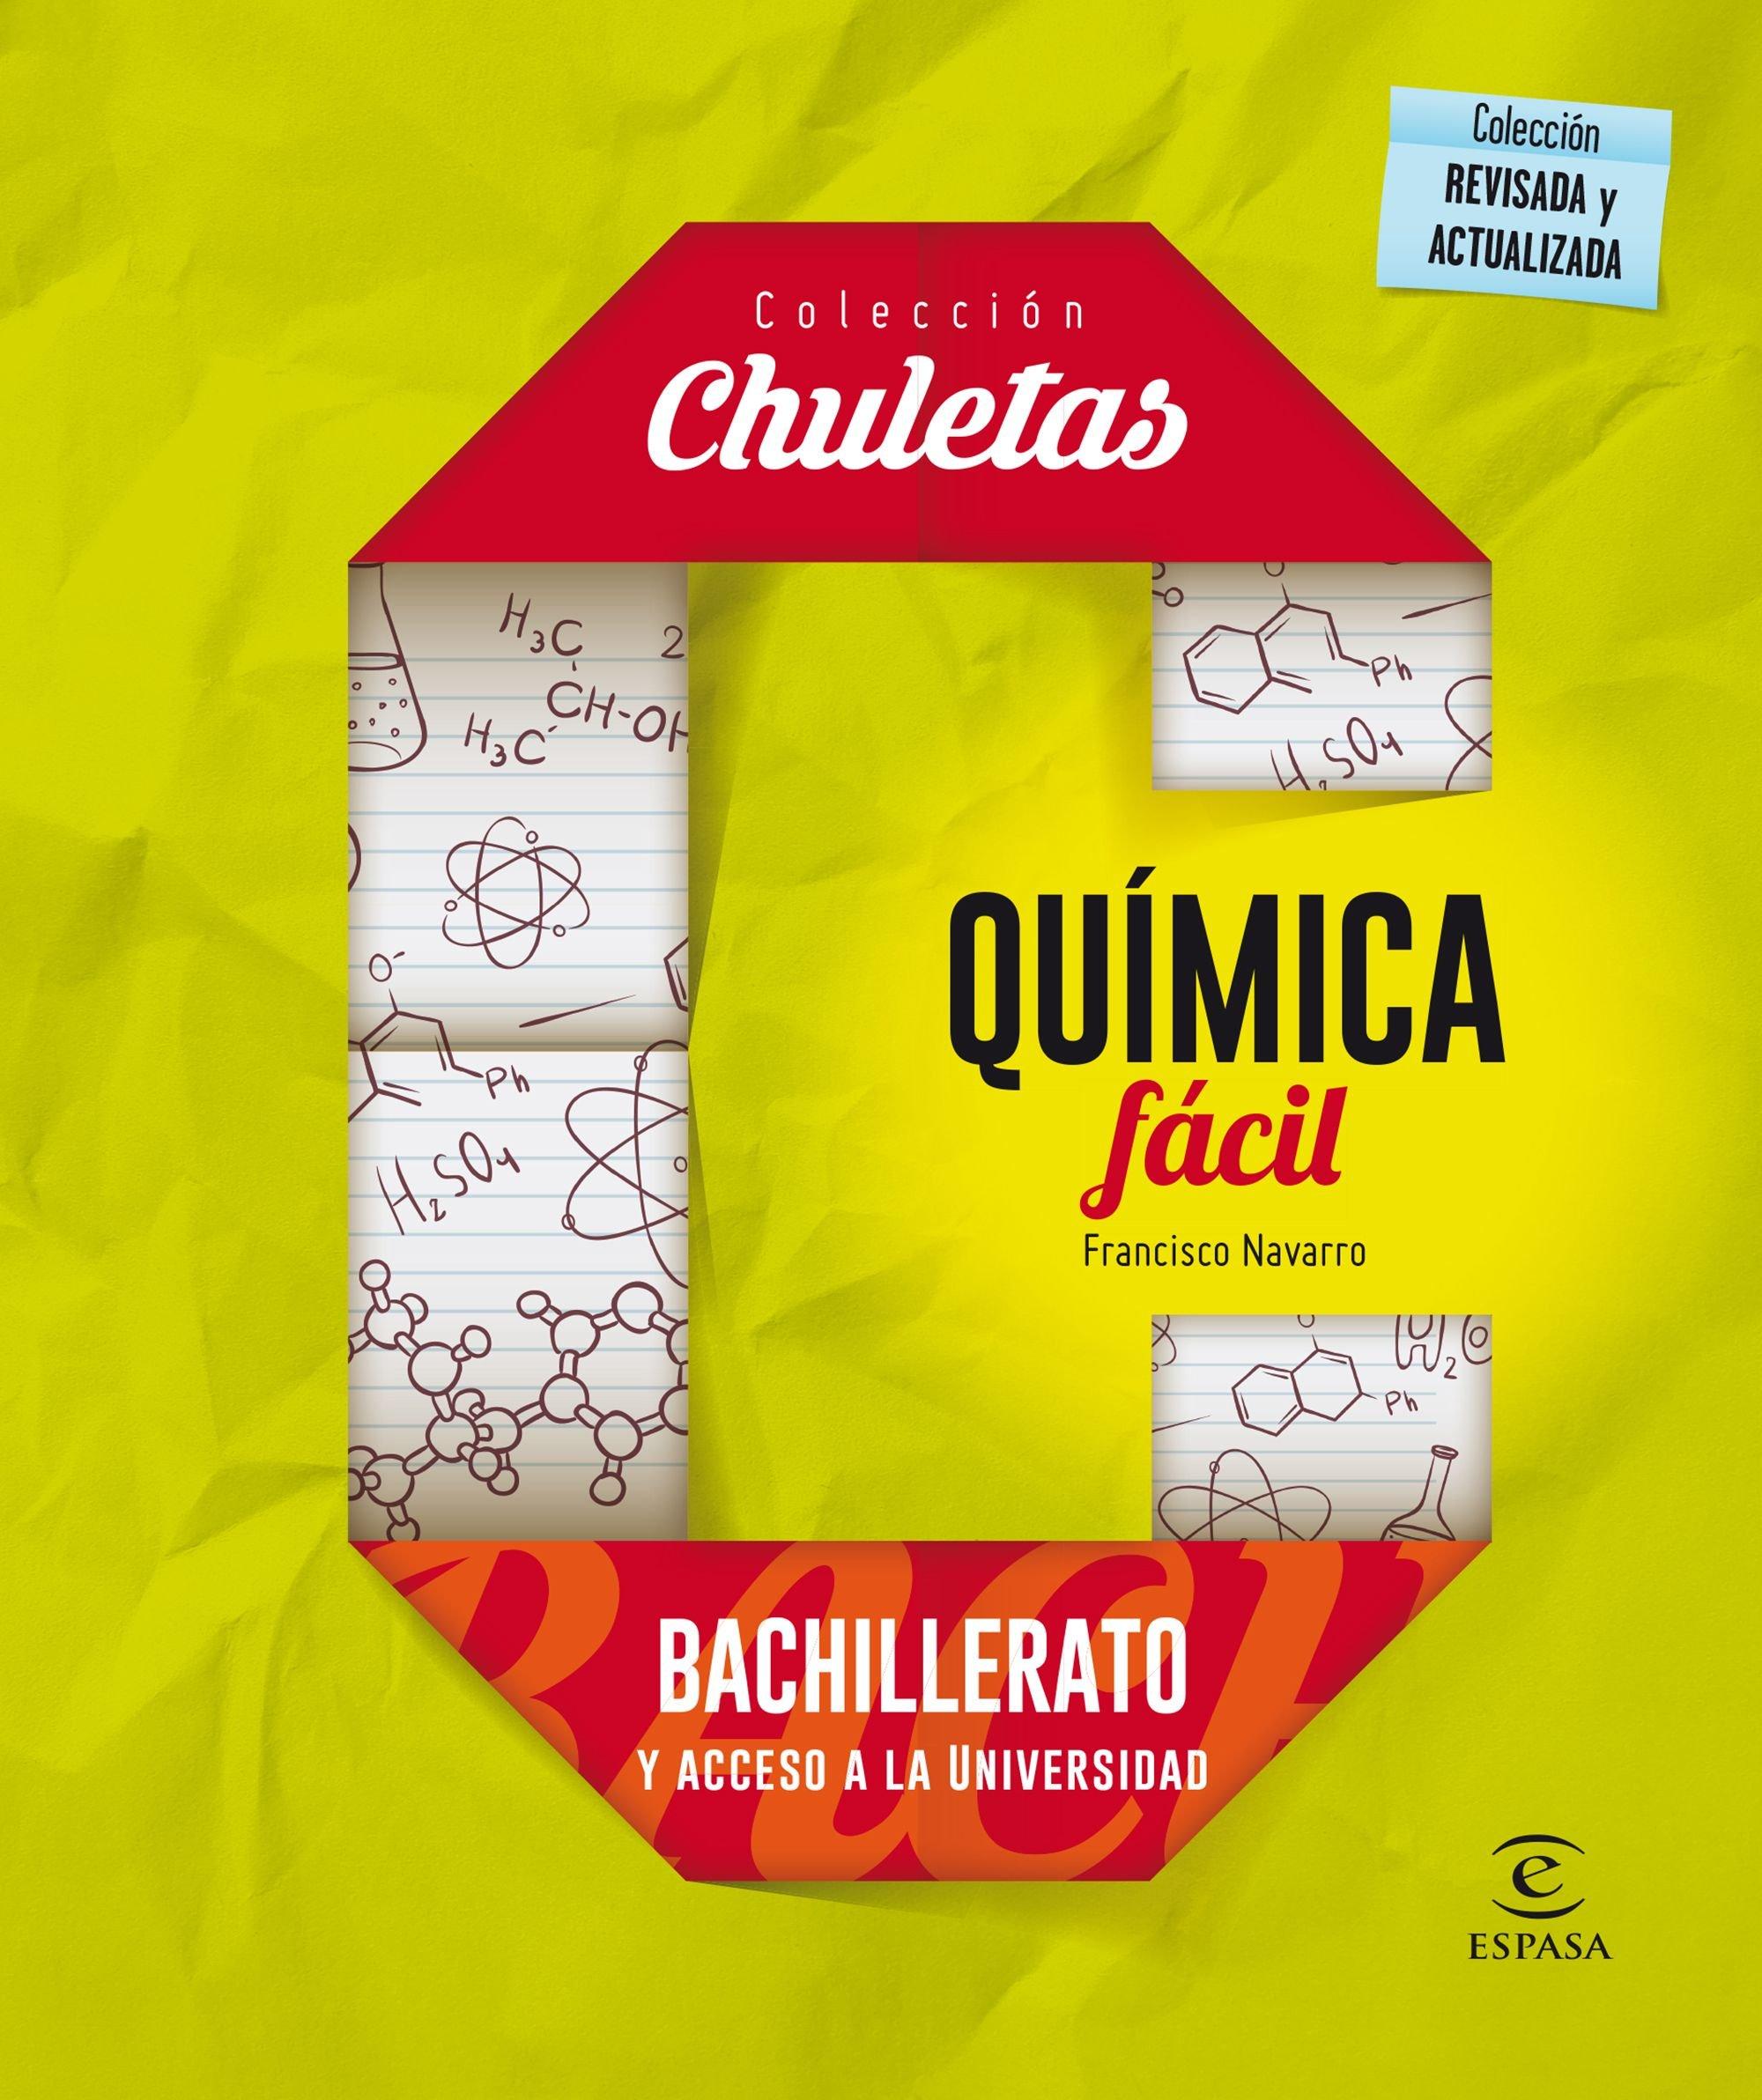 Química fácil para Bachillerato - 9788467044515 CHULETAS: Amazon.es: Francisco Navarro: Libros